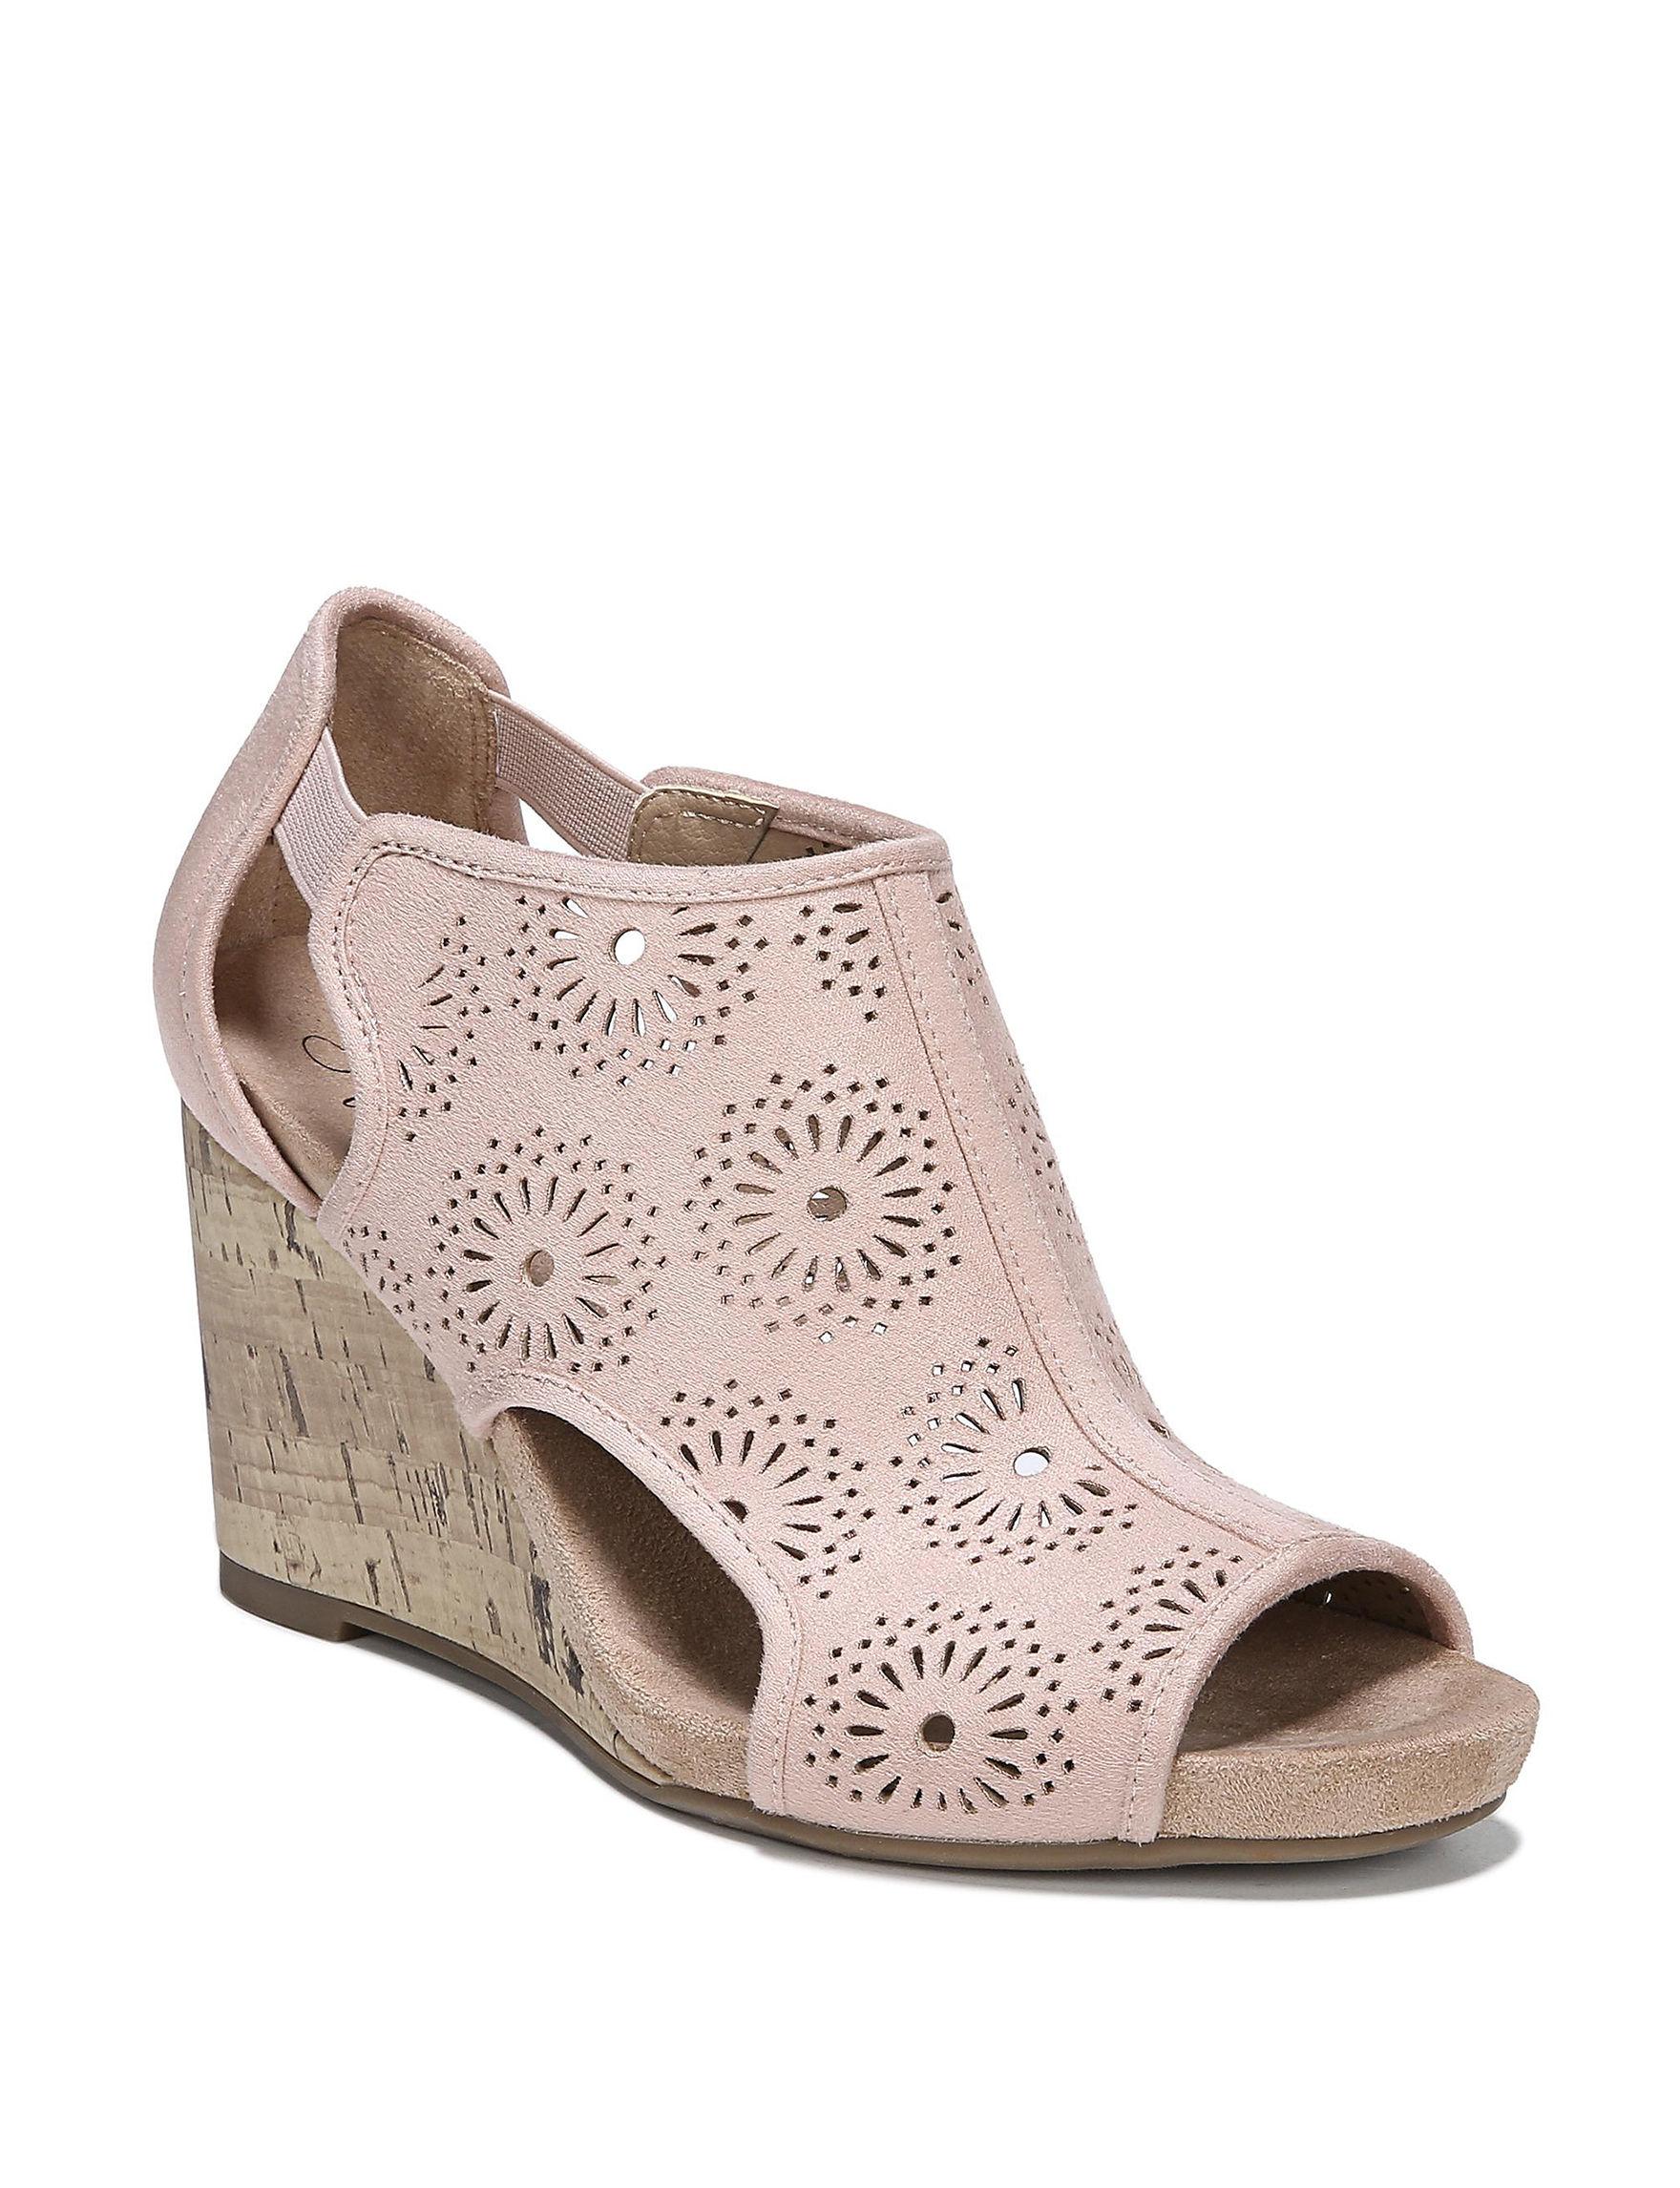 Lifestride Blush Peep Toe Wedge Sandals